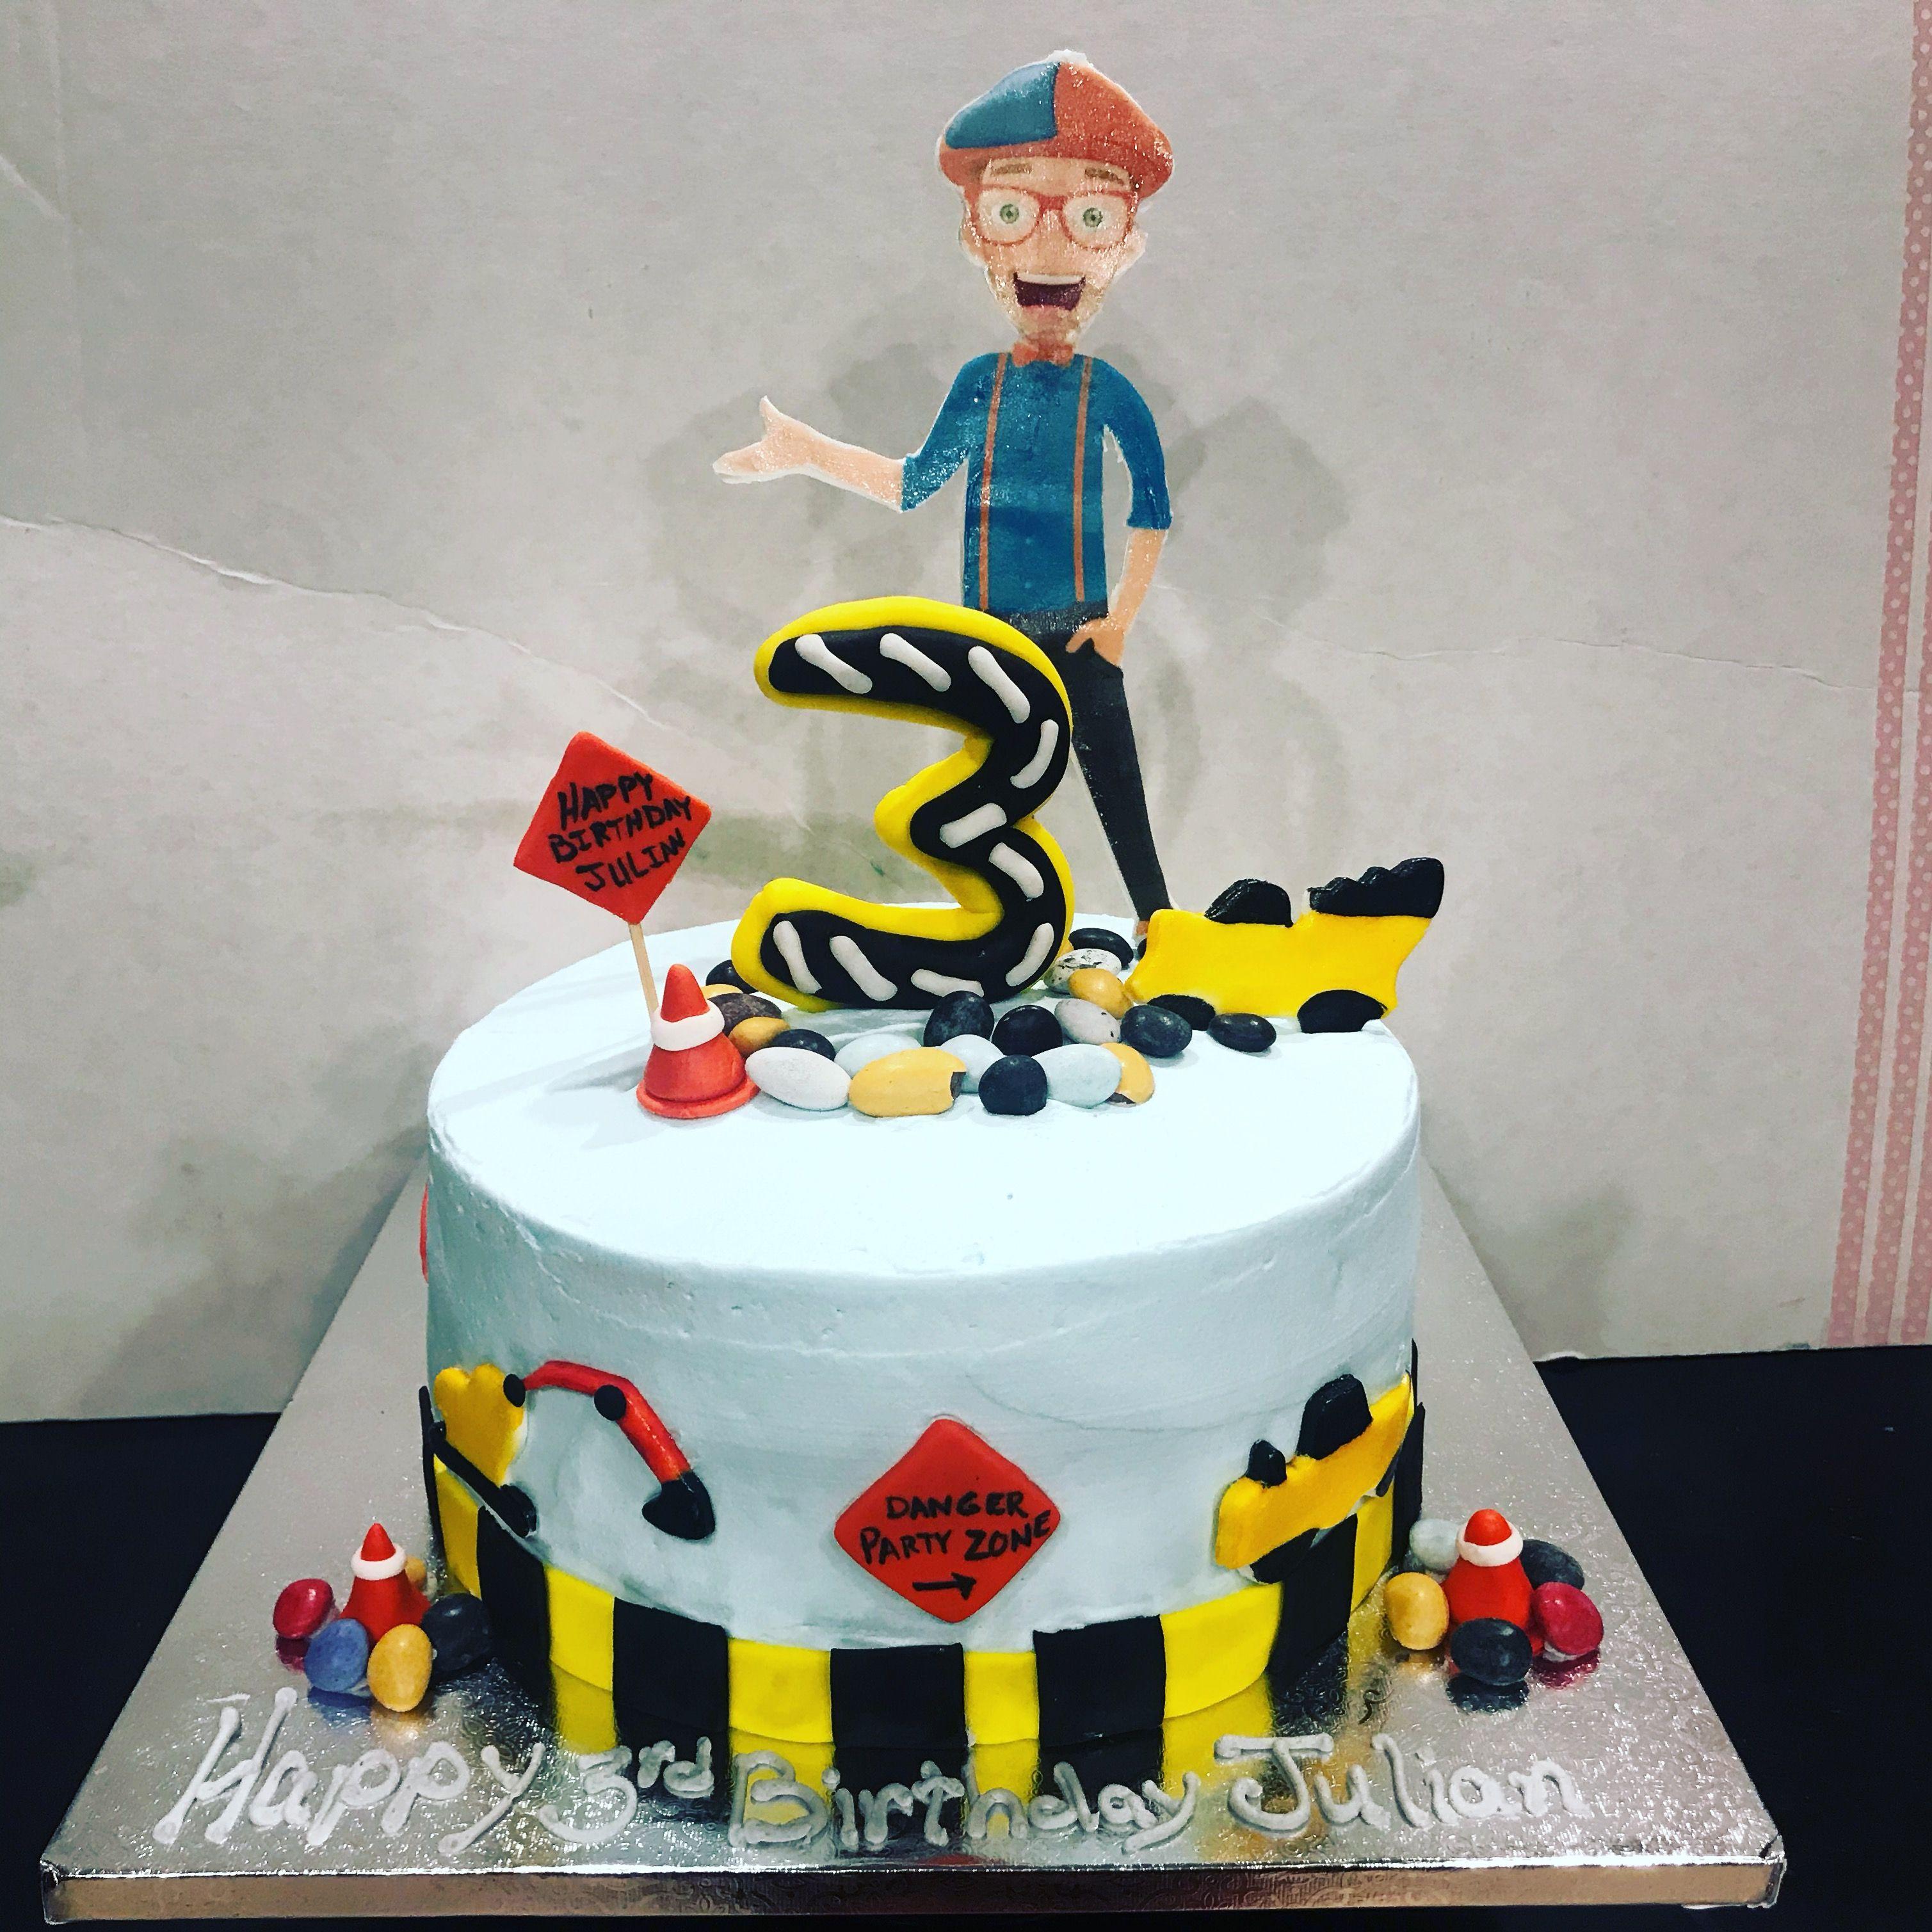 Blippi cake its a construction cake too saturday